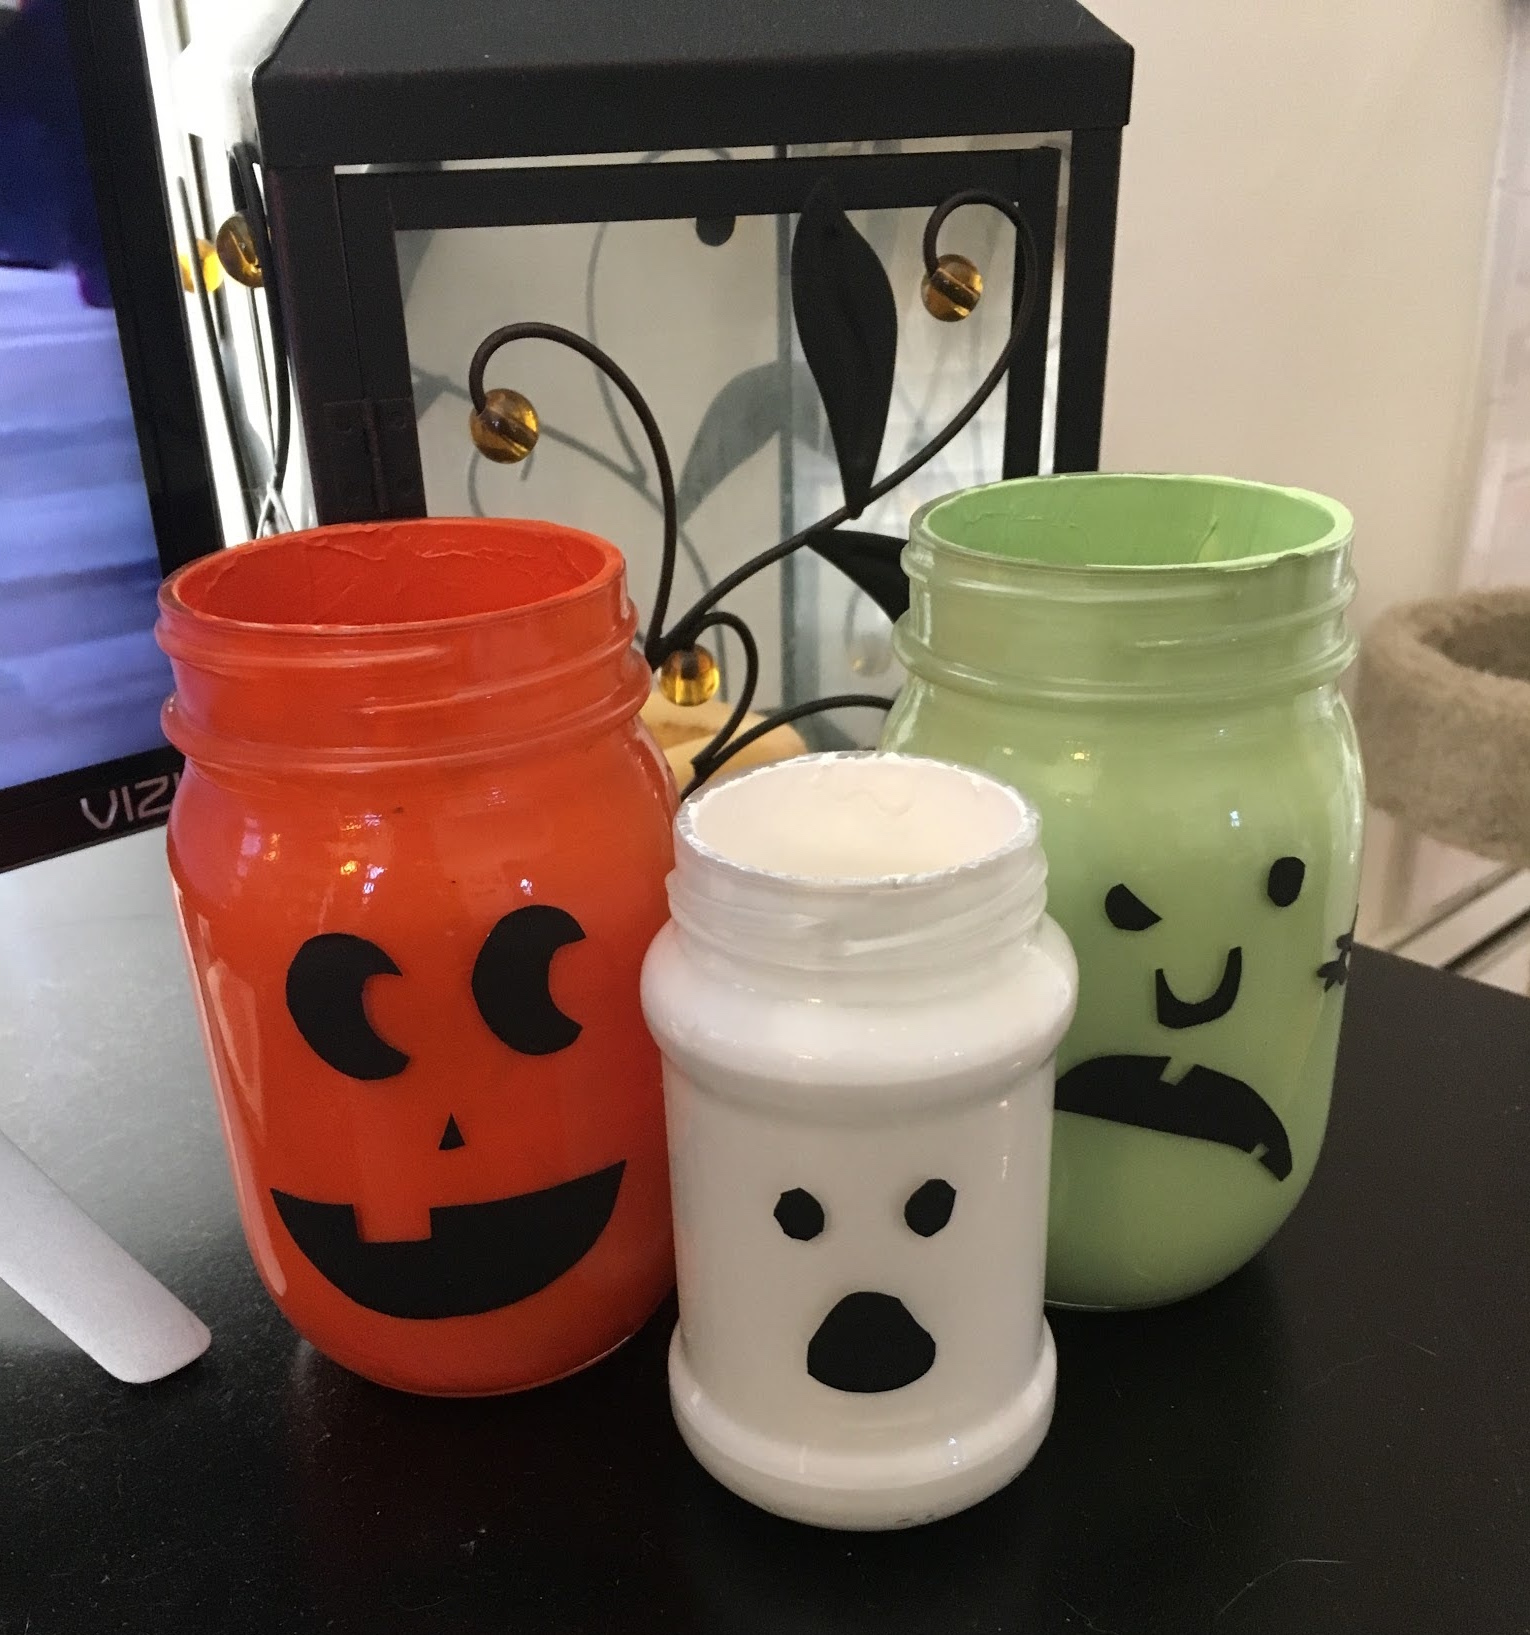 A sample of Megan's Halloween Crafting!